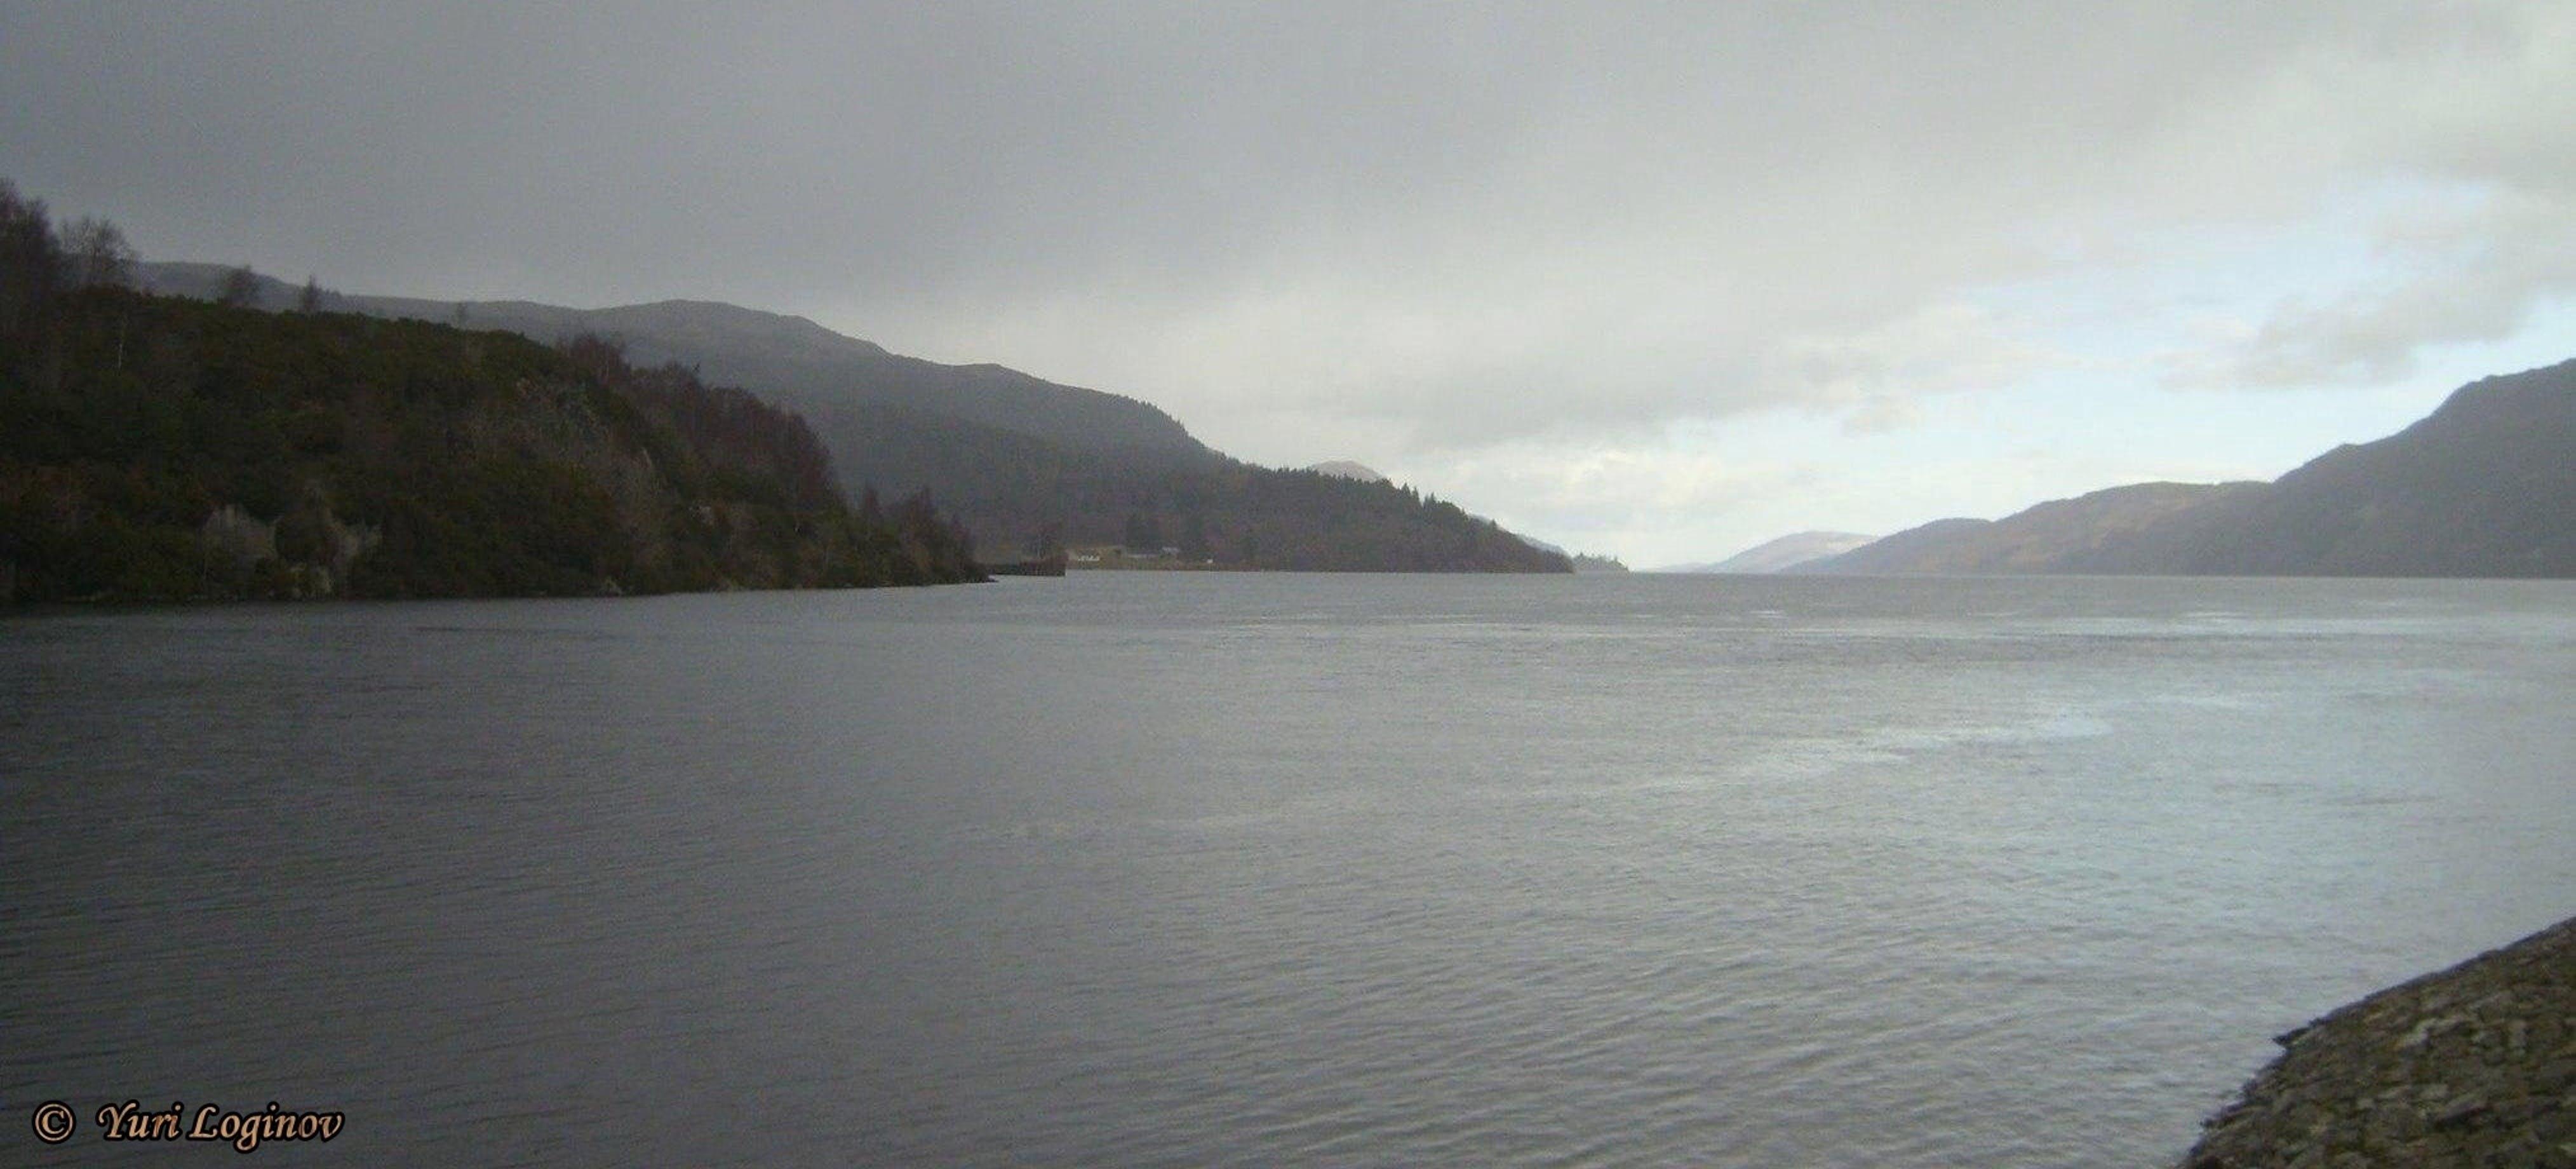 Free stock photo of scotland, united kingdom, loch ness, Grampian Mountains